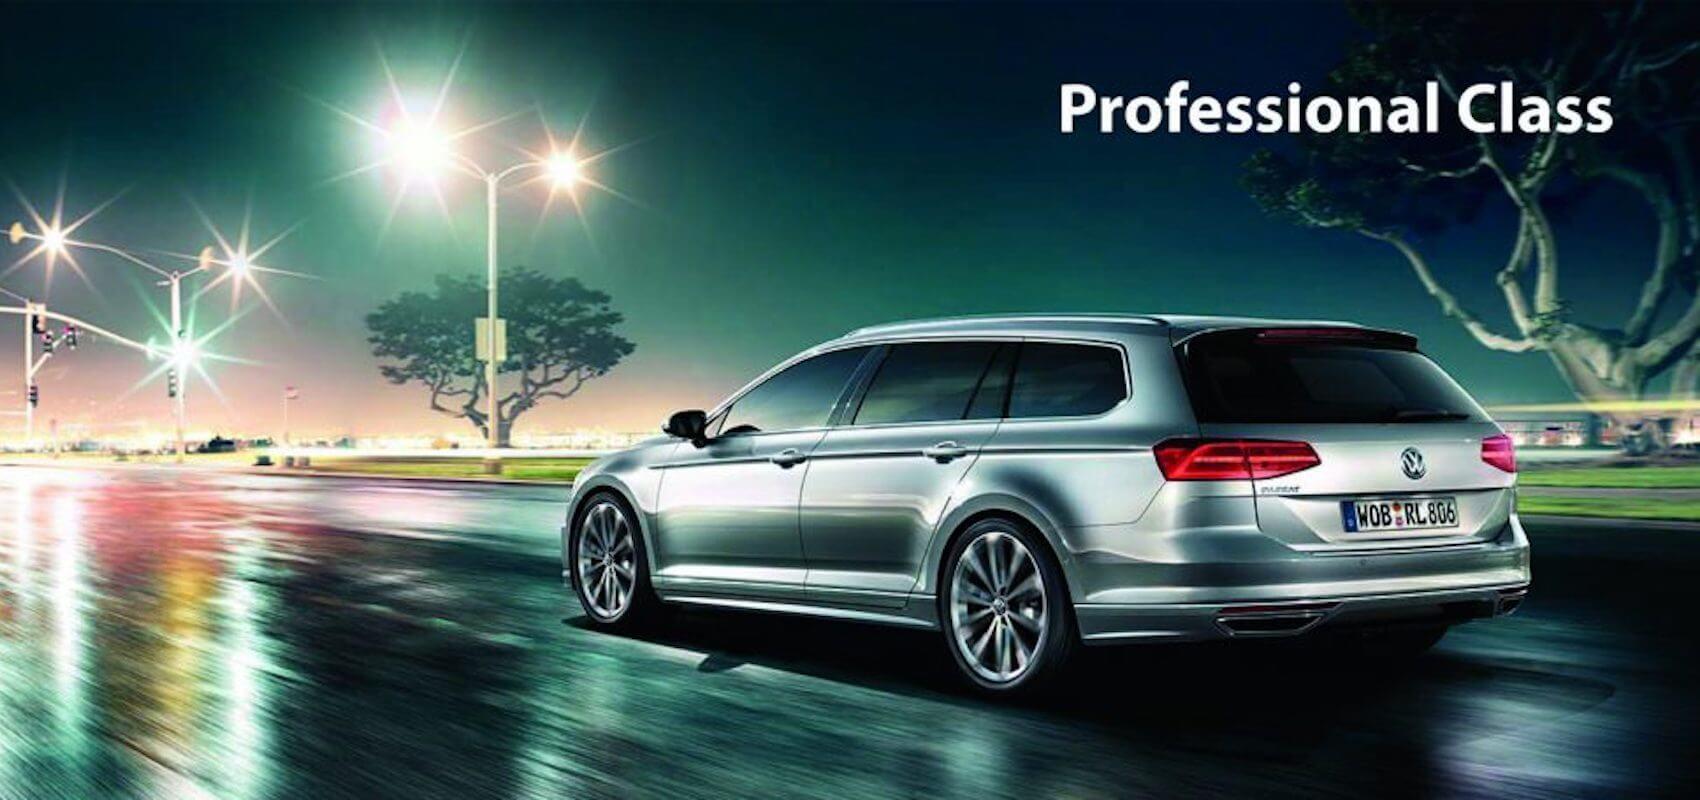 professionalclass-1024x455